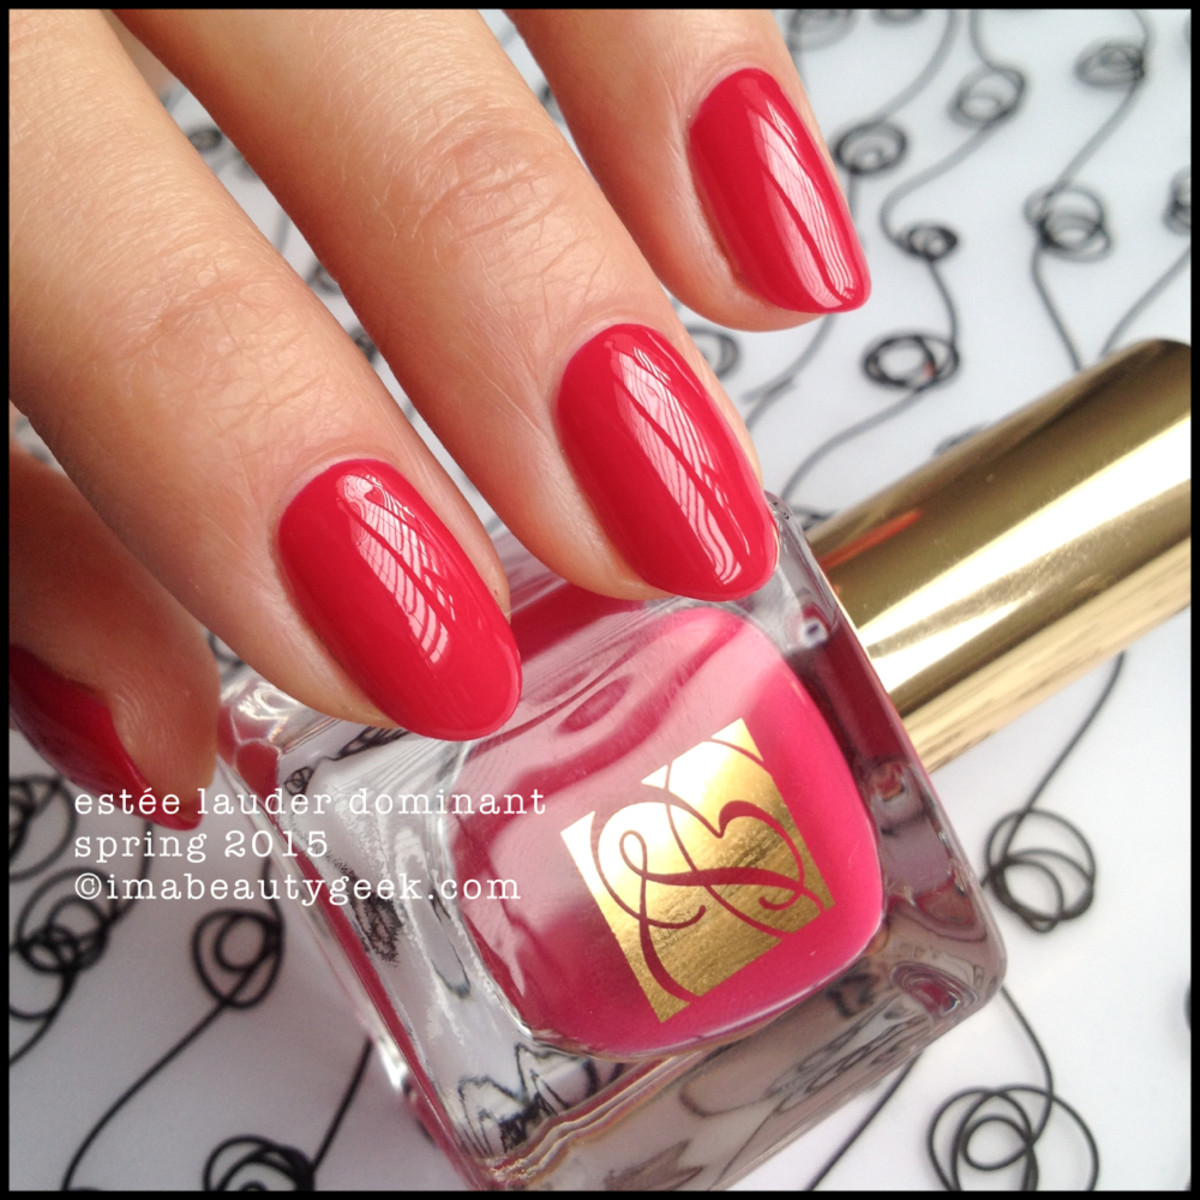 Estee Lauder Dominant Pure Color Nail Envy Spring 2015